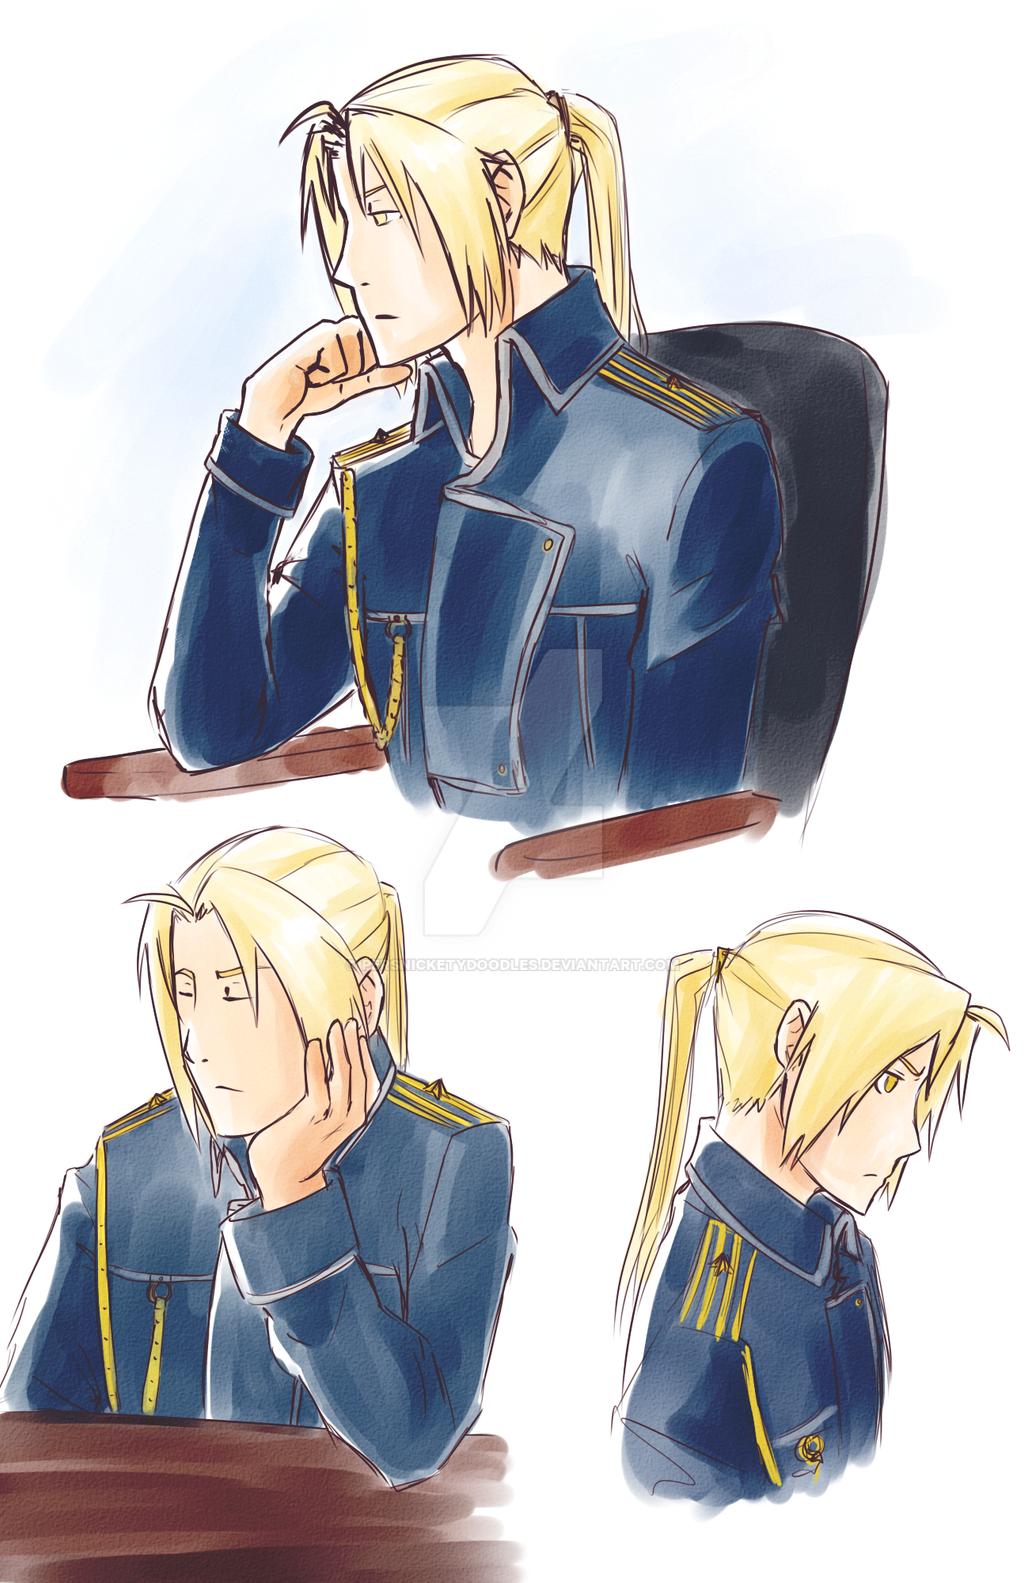 Ed in Uniform by Perfectlykawaii93